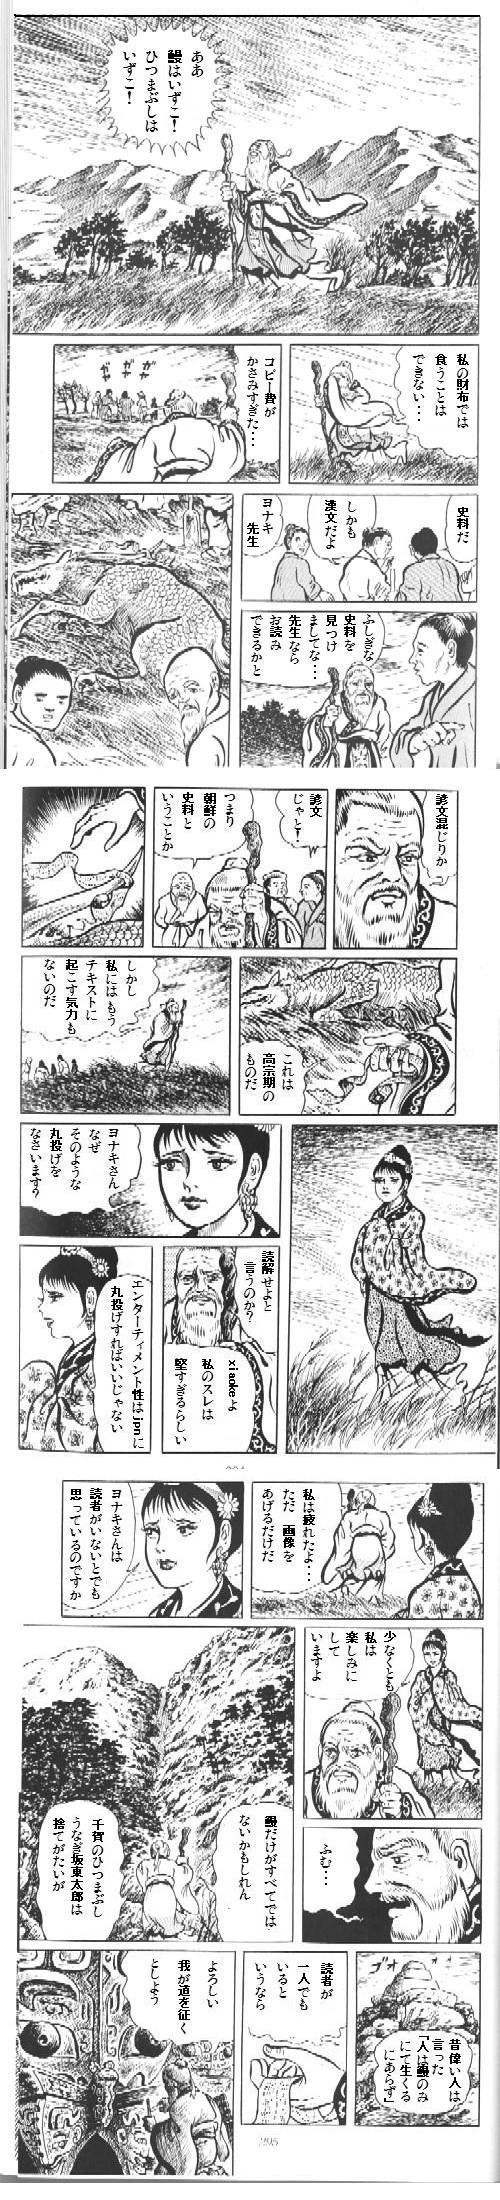 yonaki_ankoku1.jpg